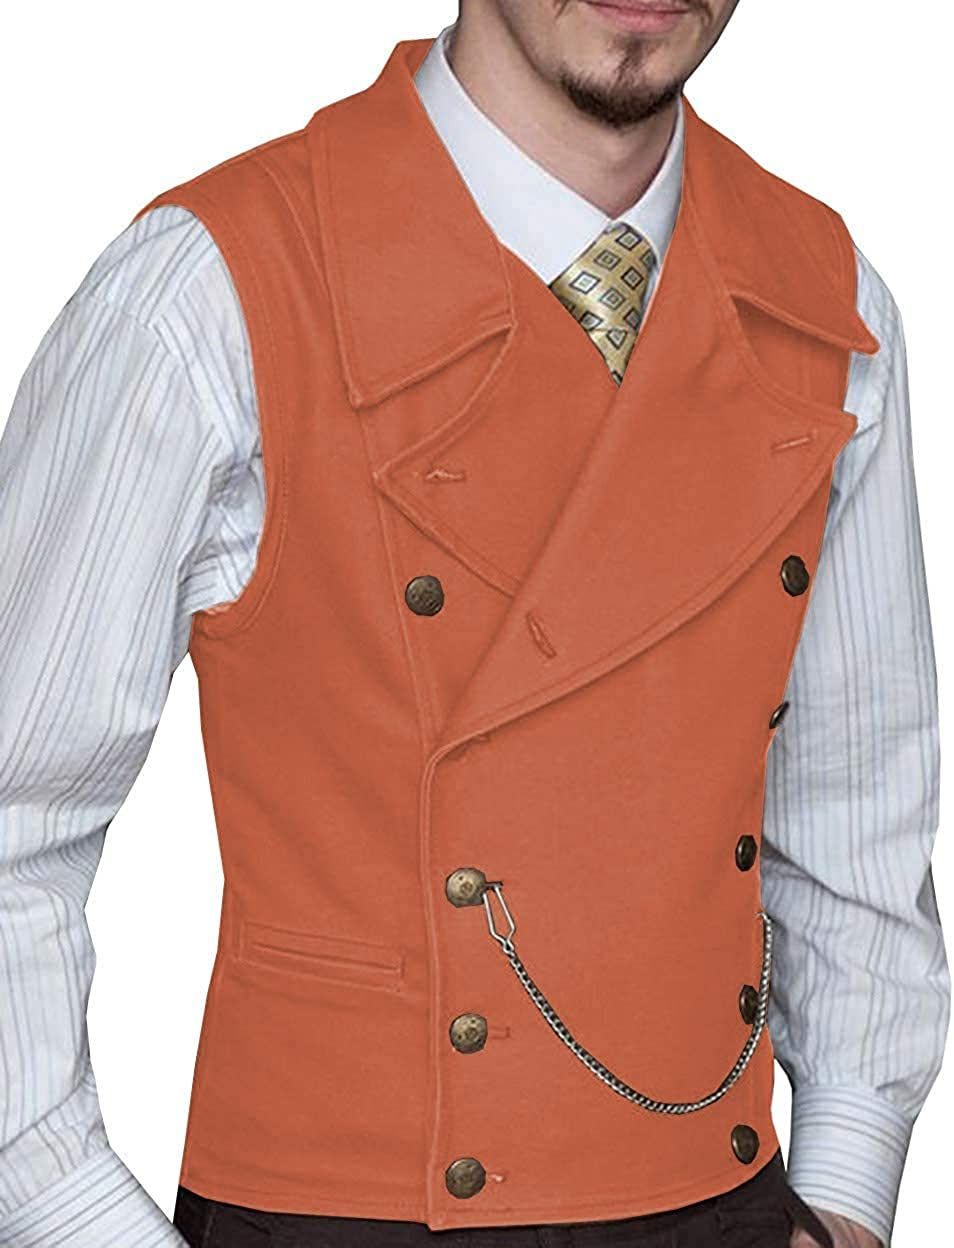 Mens Double Breasted Suit Slim Fit Vest Suede Lapel Waistcoat for Wedding Groomsmen